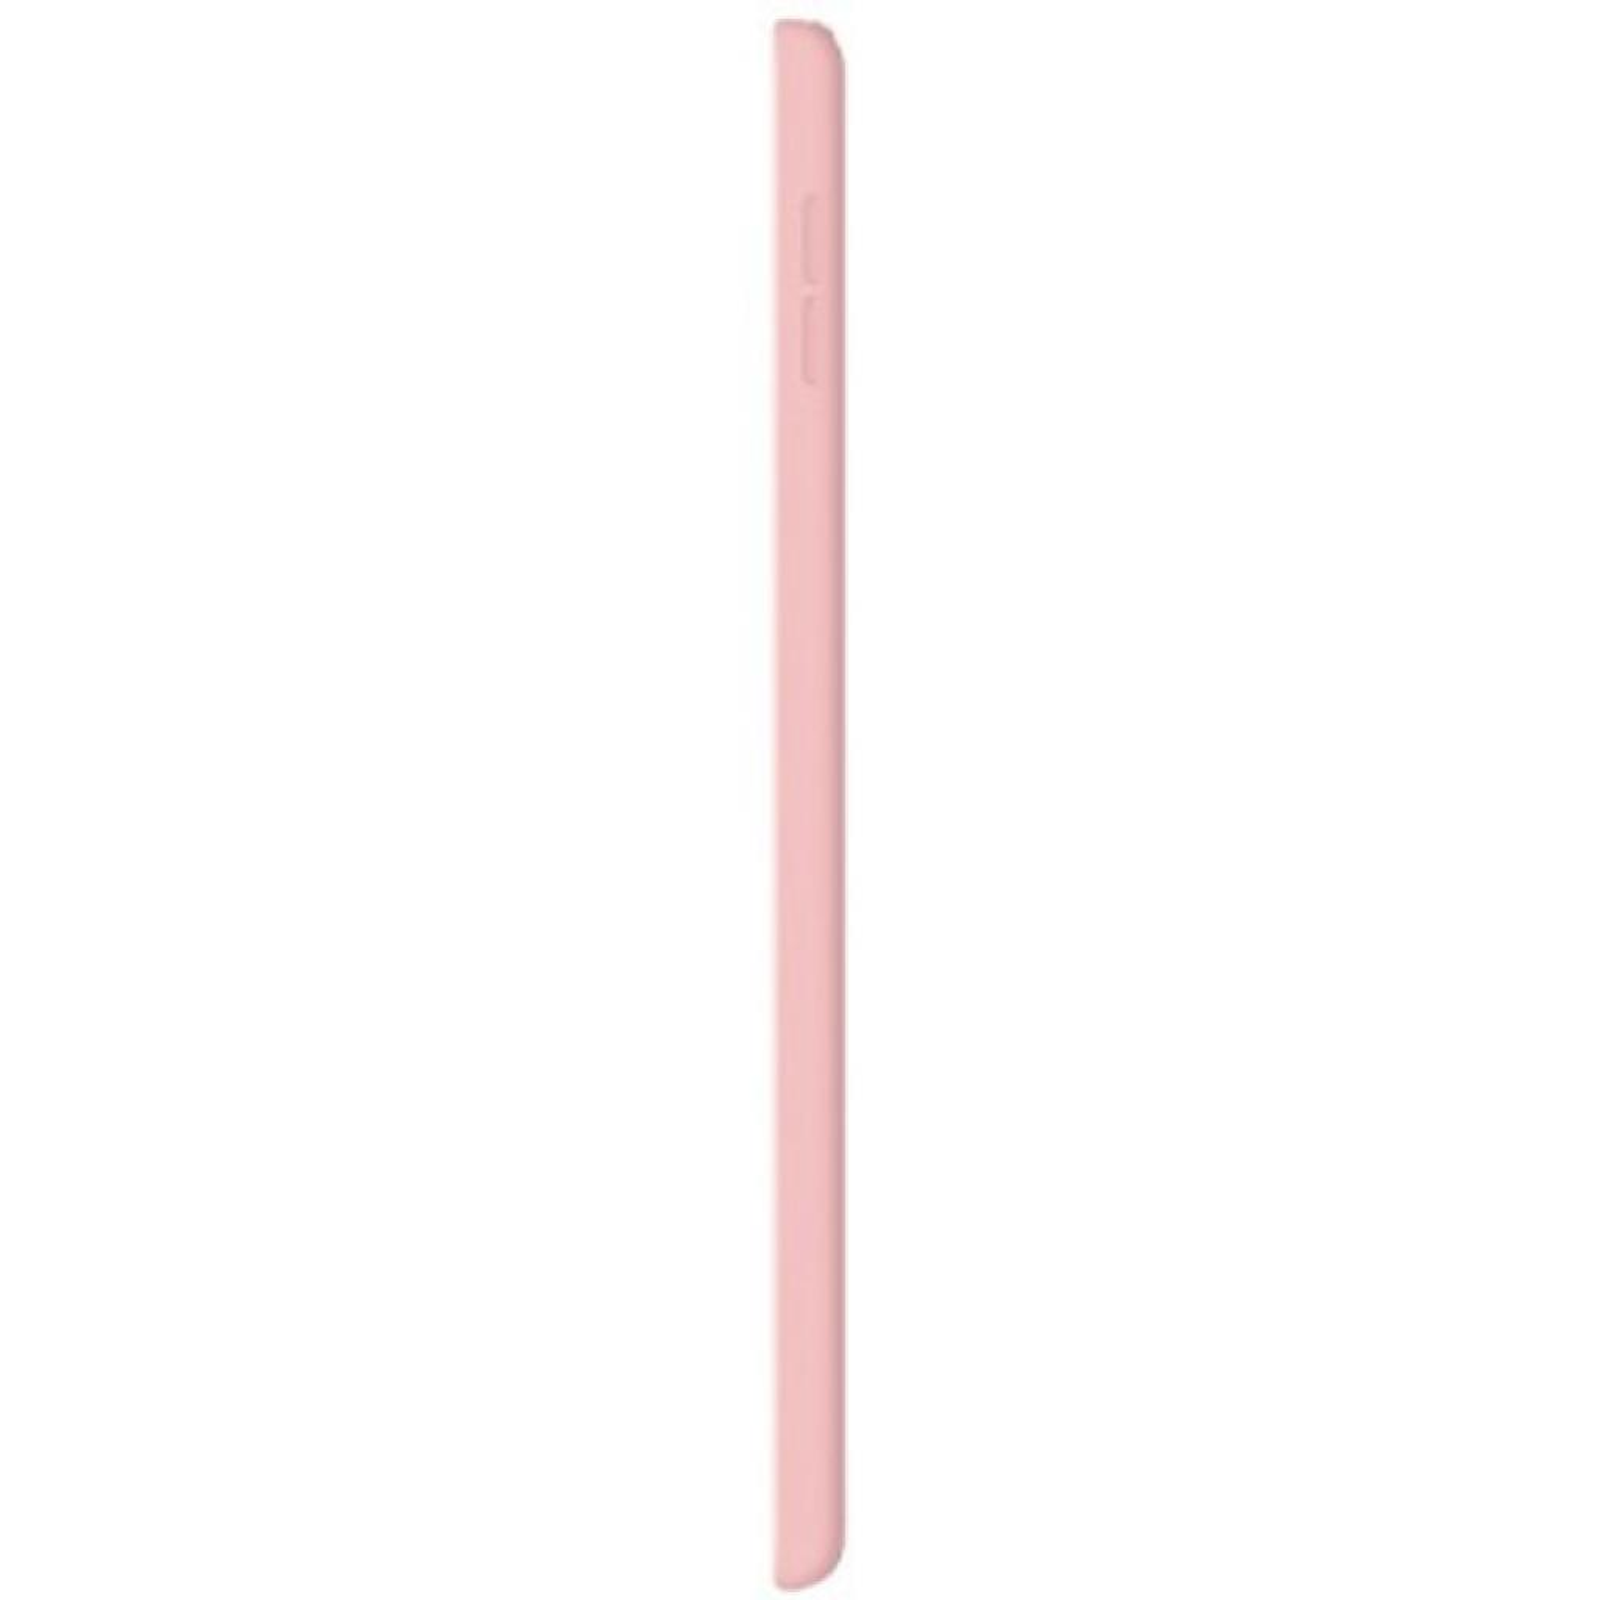 Чехол для планшета Apple iPad mini 4 Pink (MLD52ZM/A) изображение 5